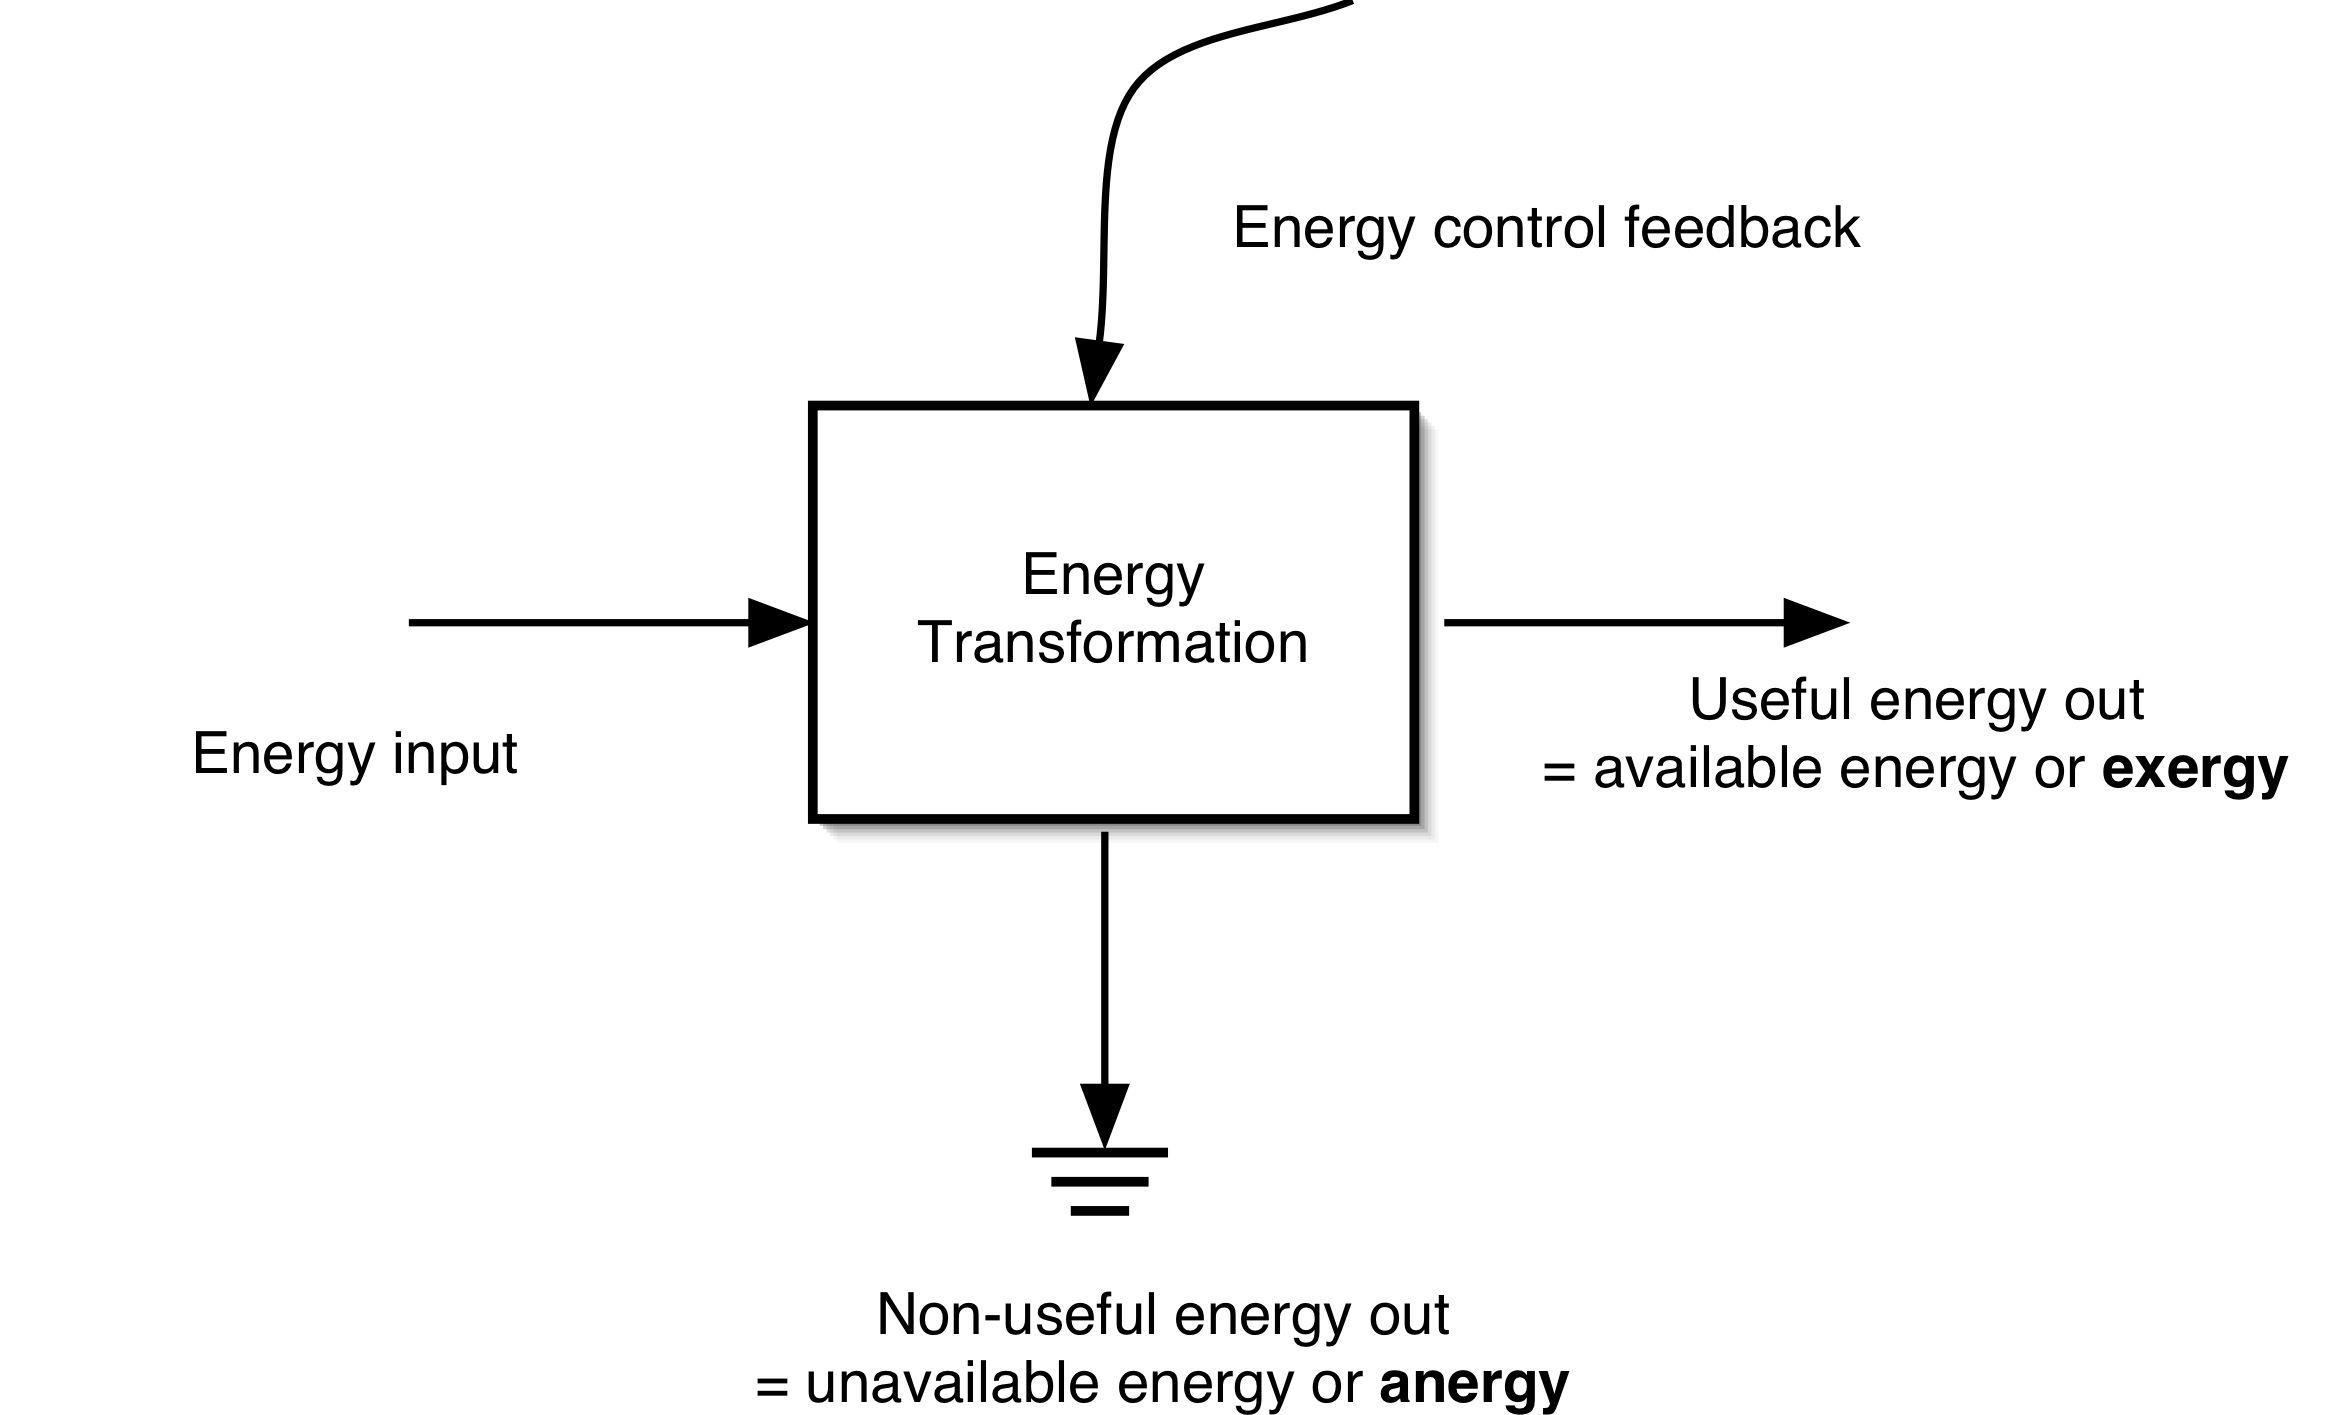 file:generic energy transformation - wikipedia